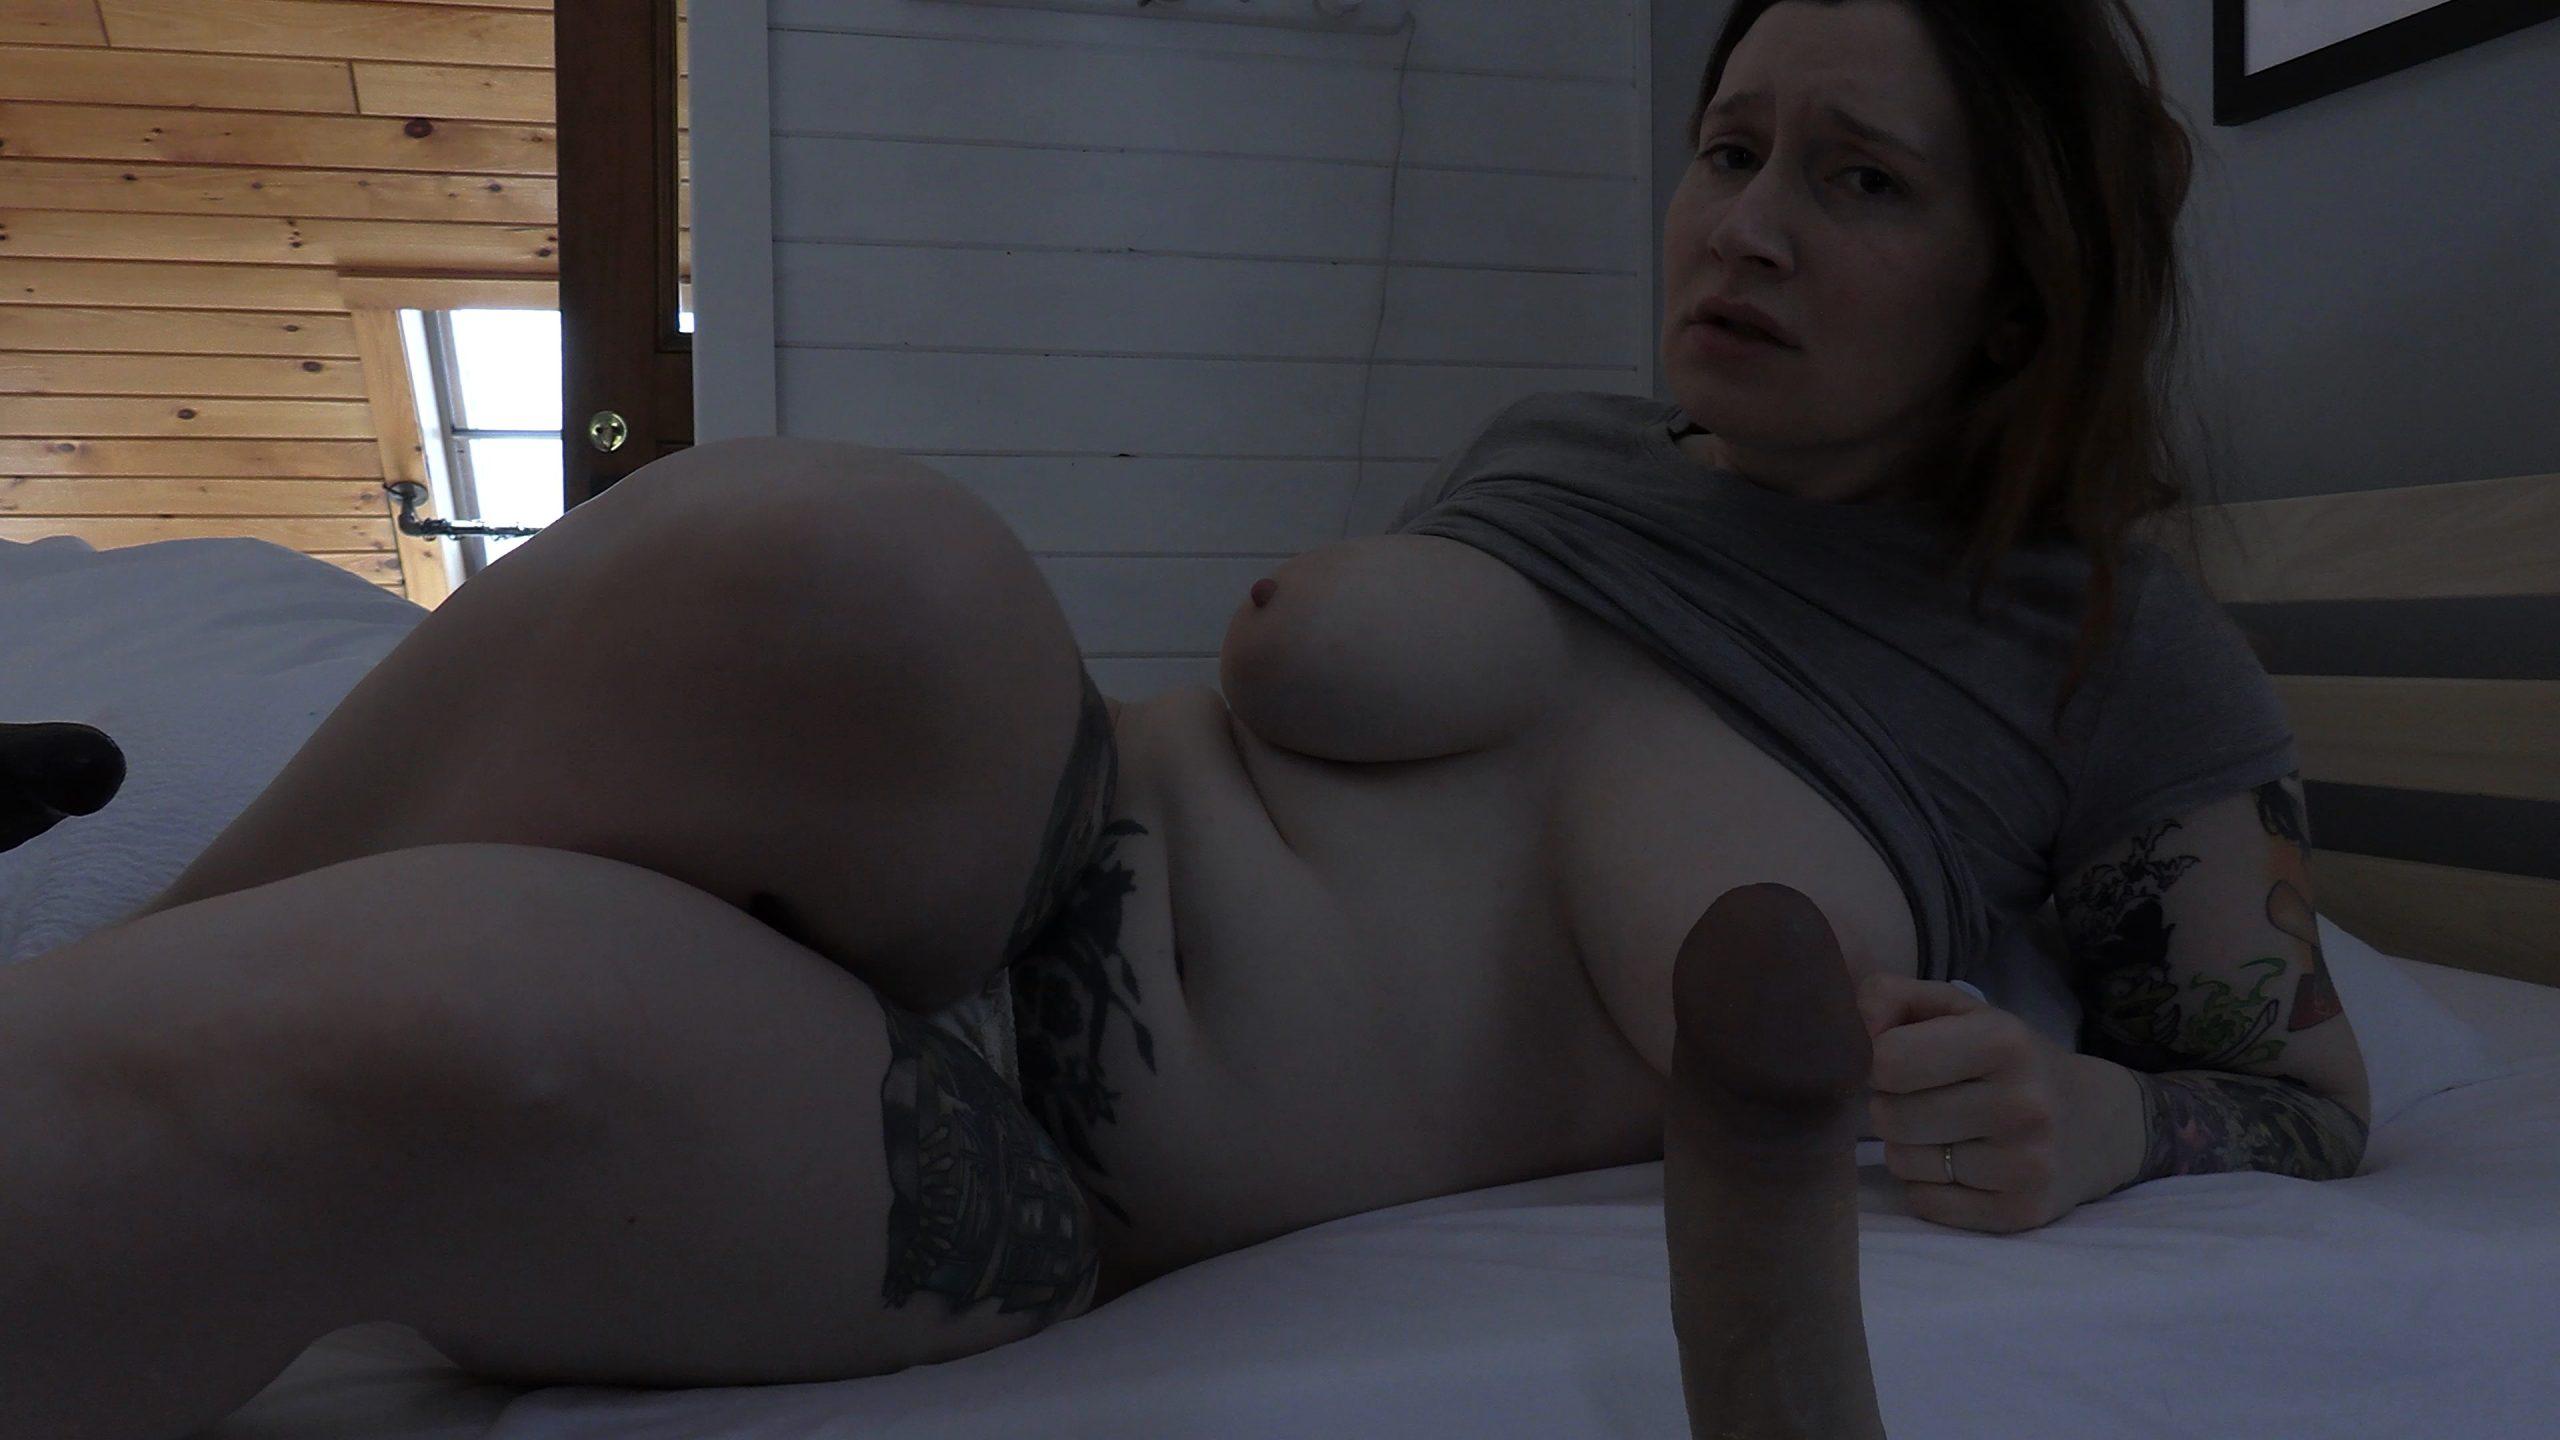 Bettie Bondage - Sleepover Blackmail Gangbang 4K